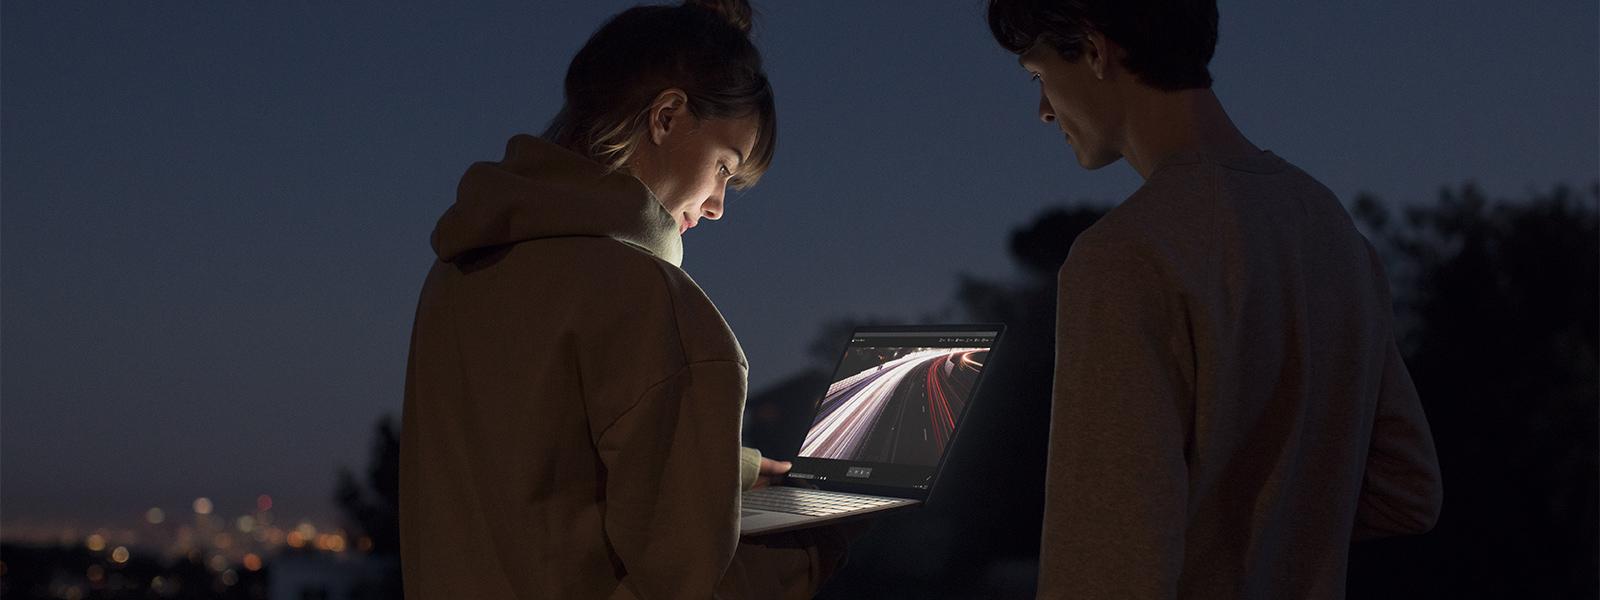 男人和女人看著 Surface PixelSense™ 顯示器